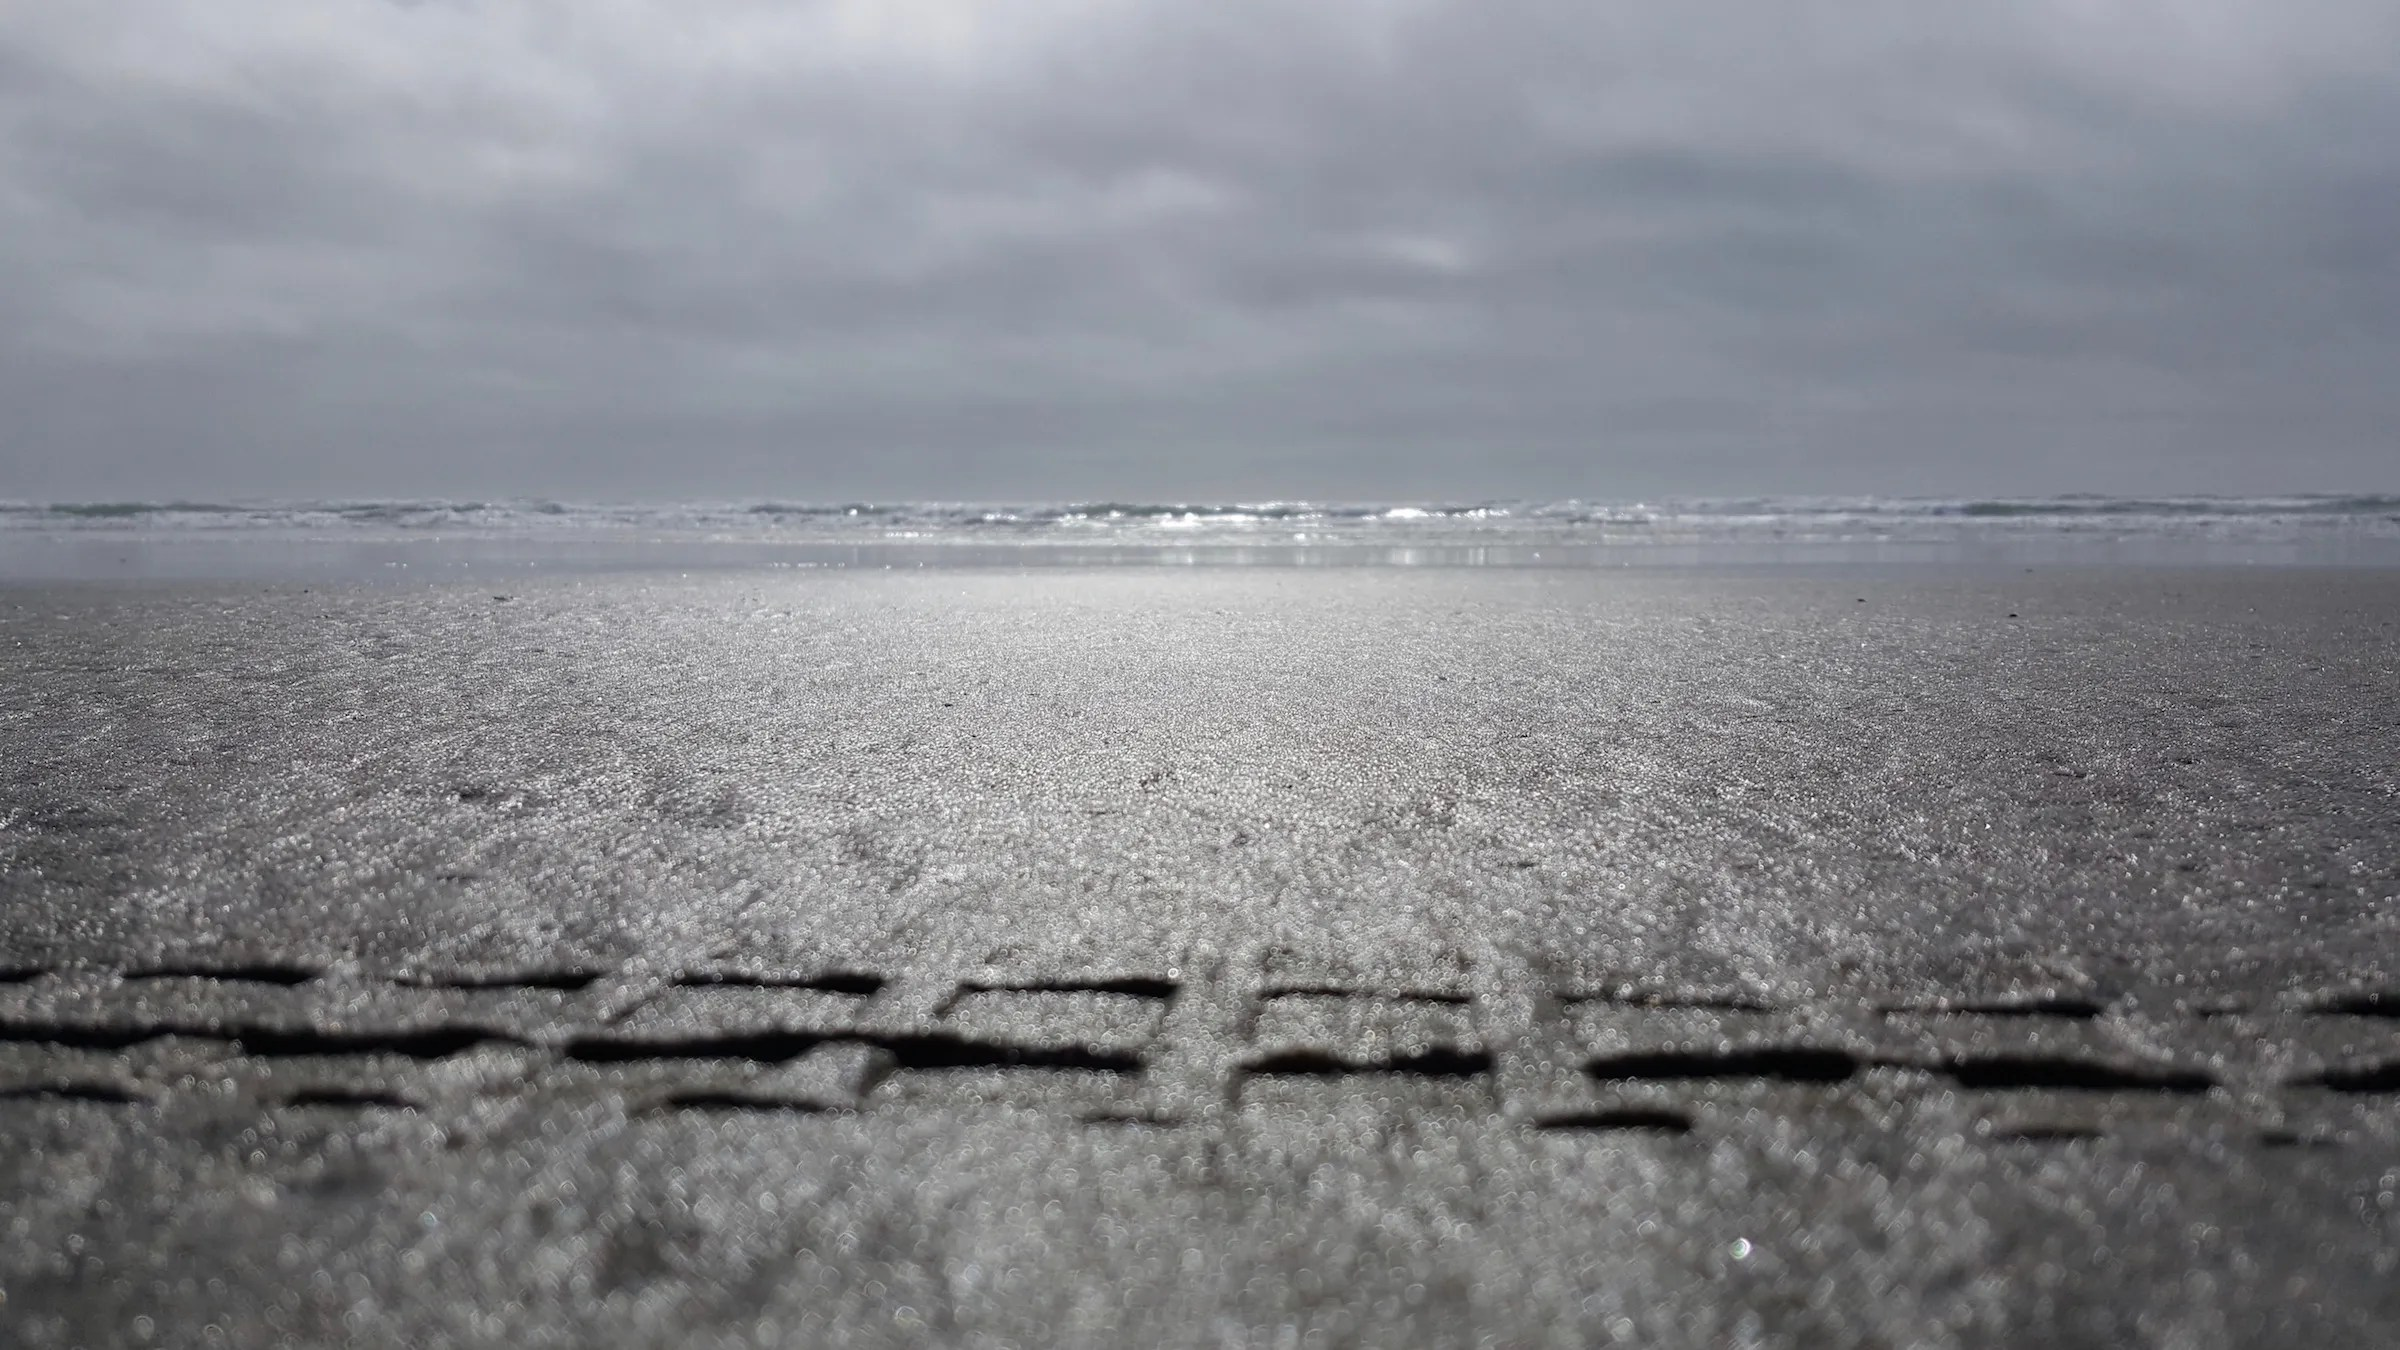 Minitrail tracks on the beach